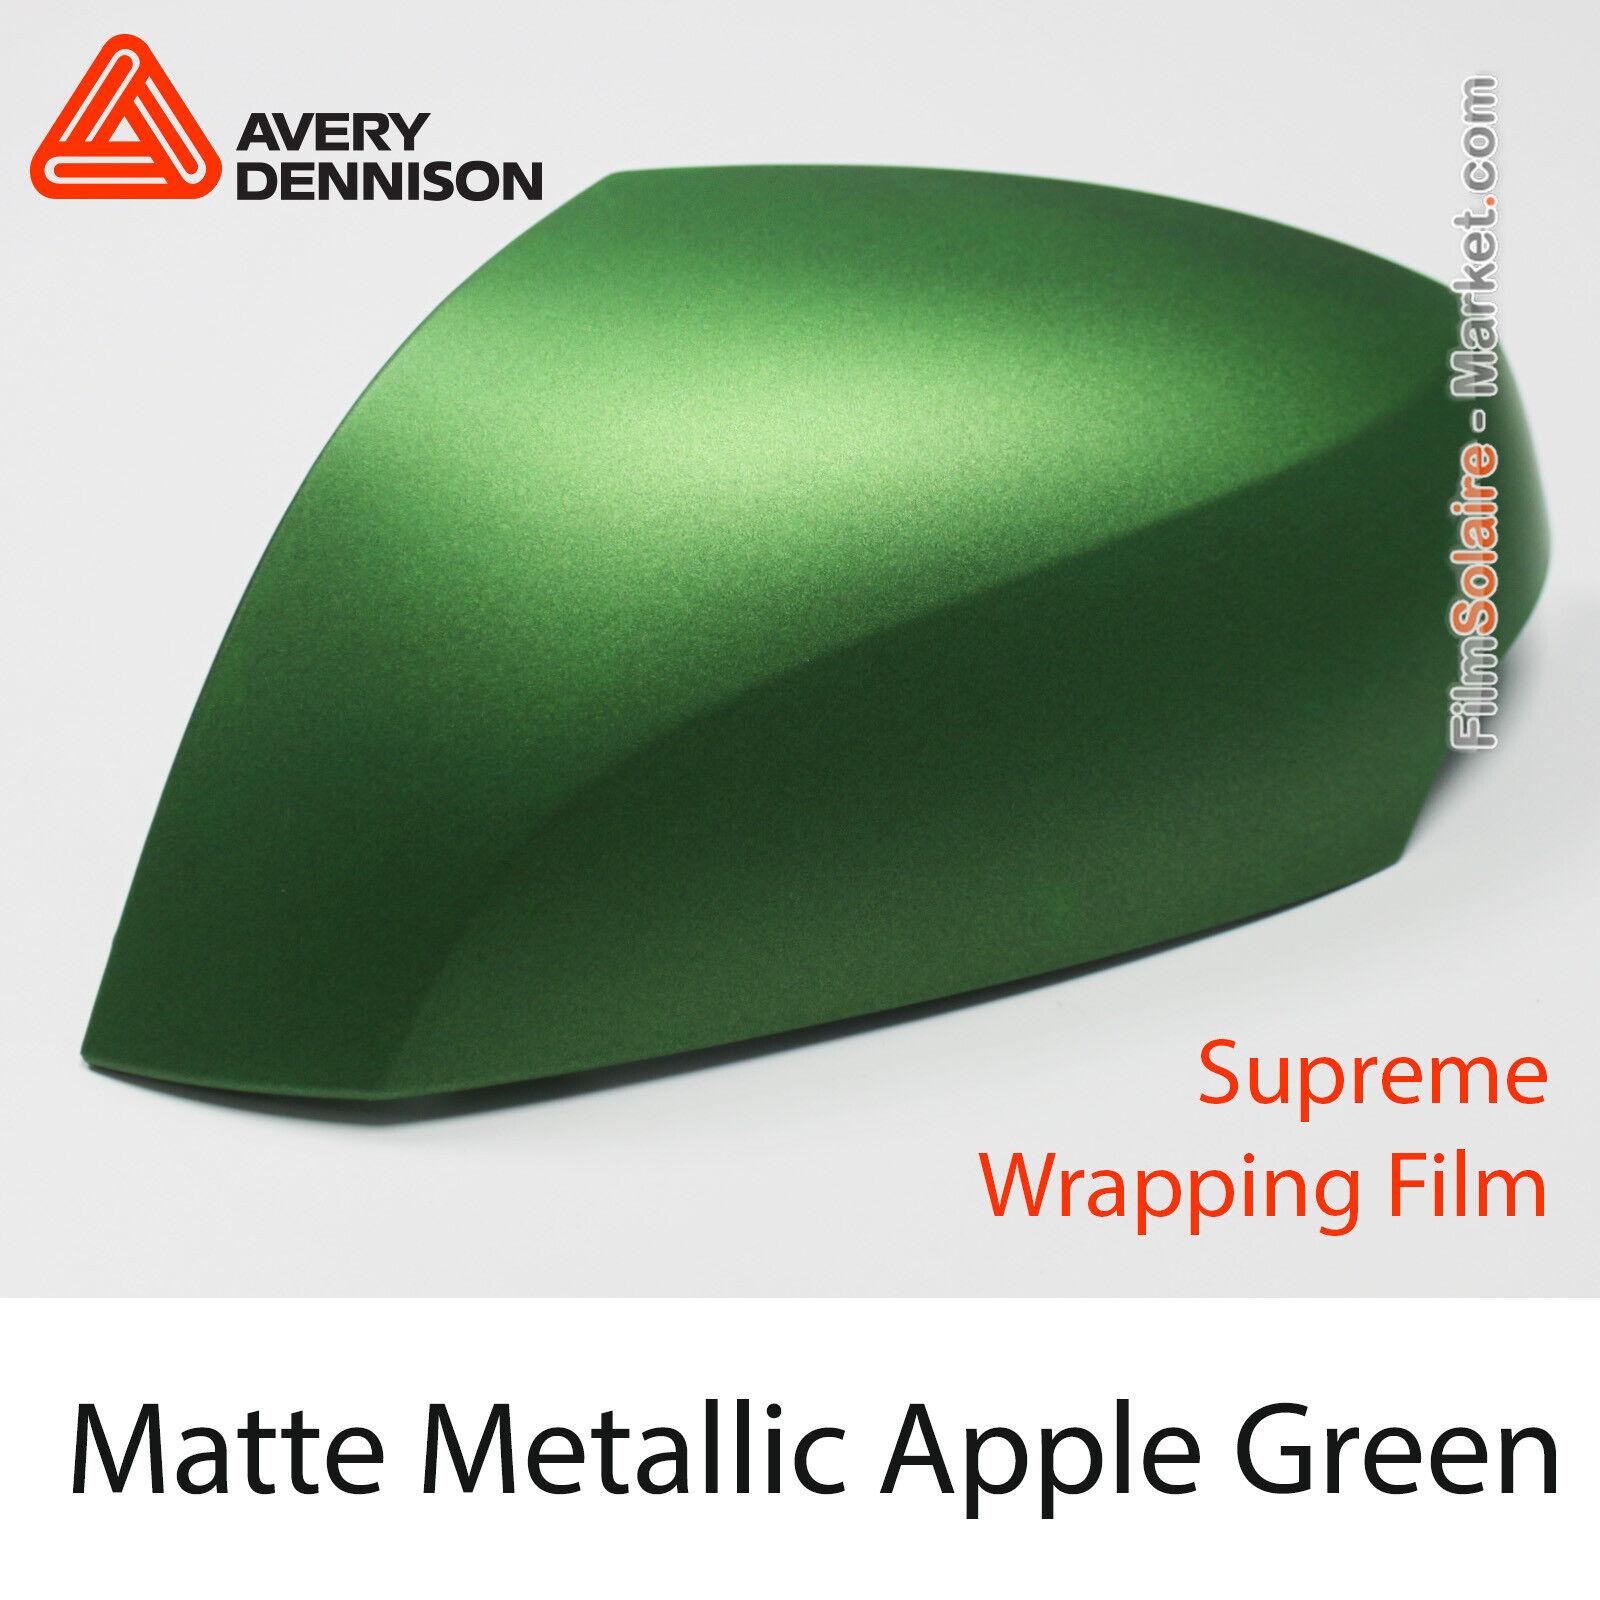 Mate Metálico Apple verde, Avery Dennison Supreme Vinil Lámina, As8970001